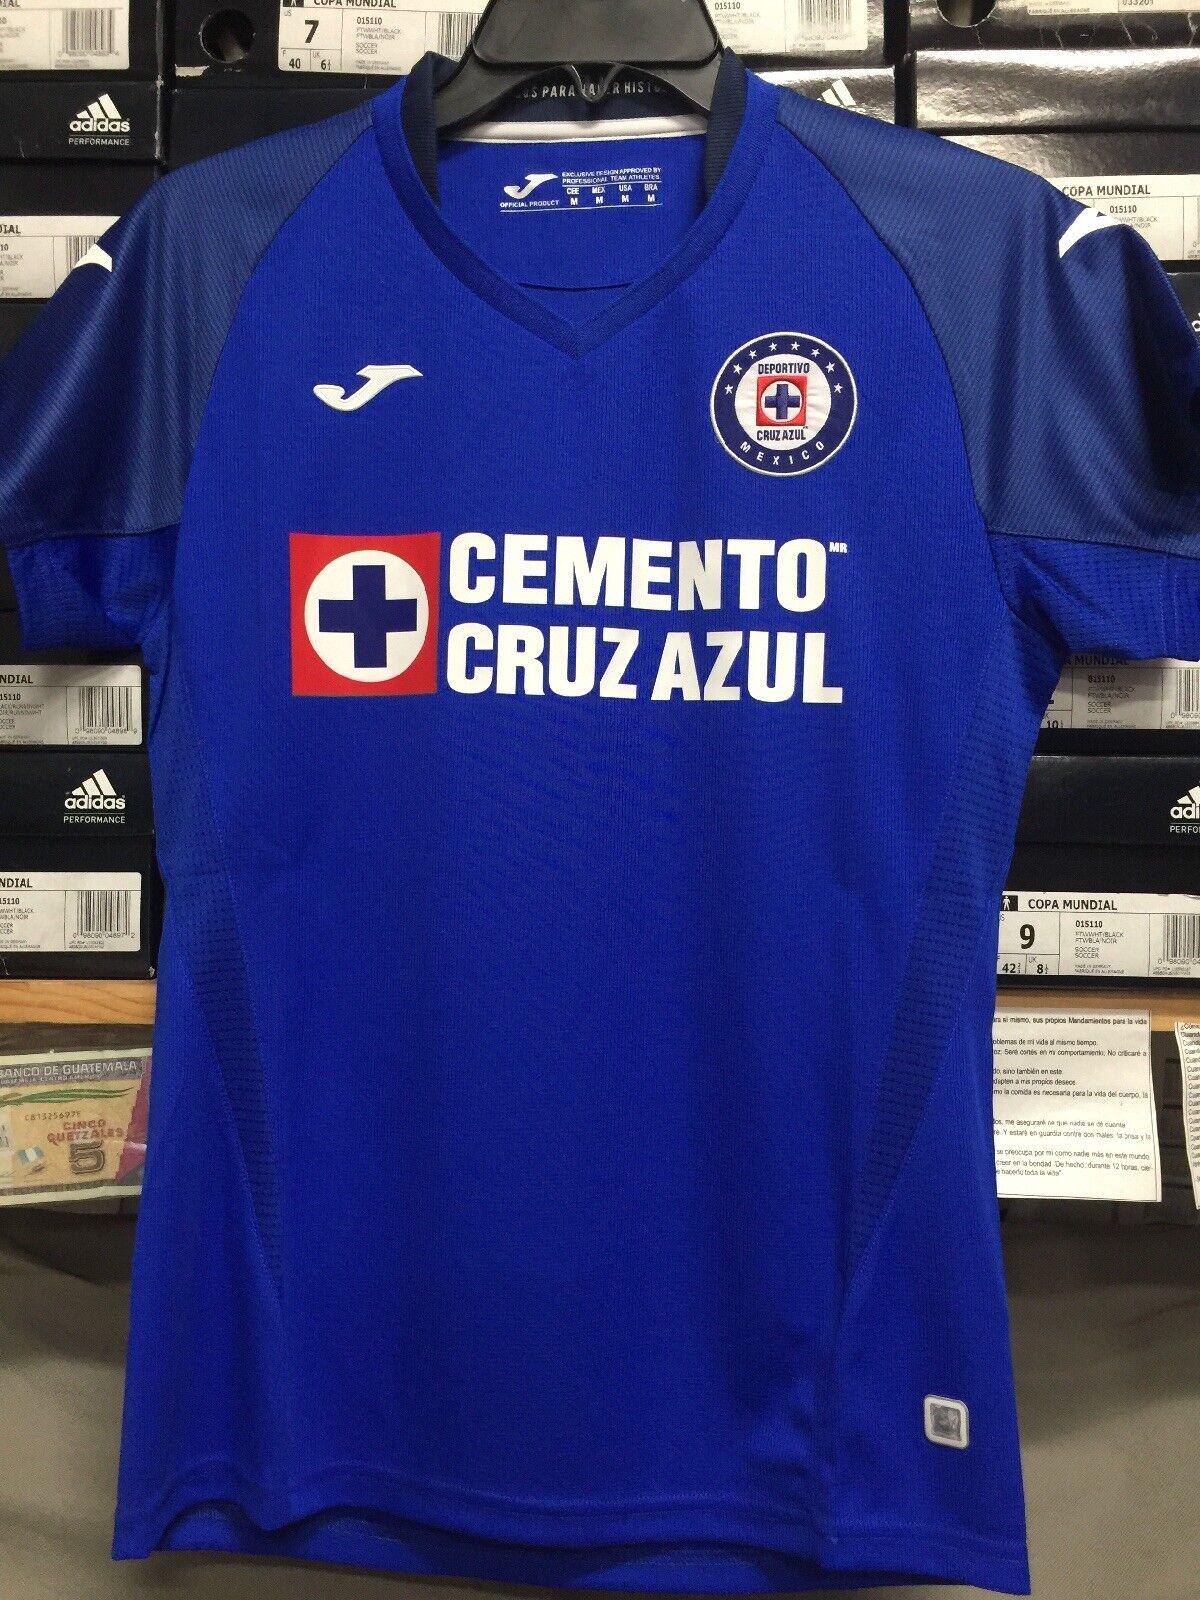 Joma Cruz blauw Womannens Jersey 19 20 Playera De vrouw De Cruz blauw afmeting Medium